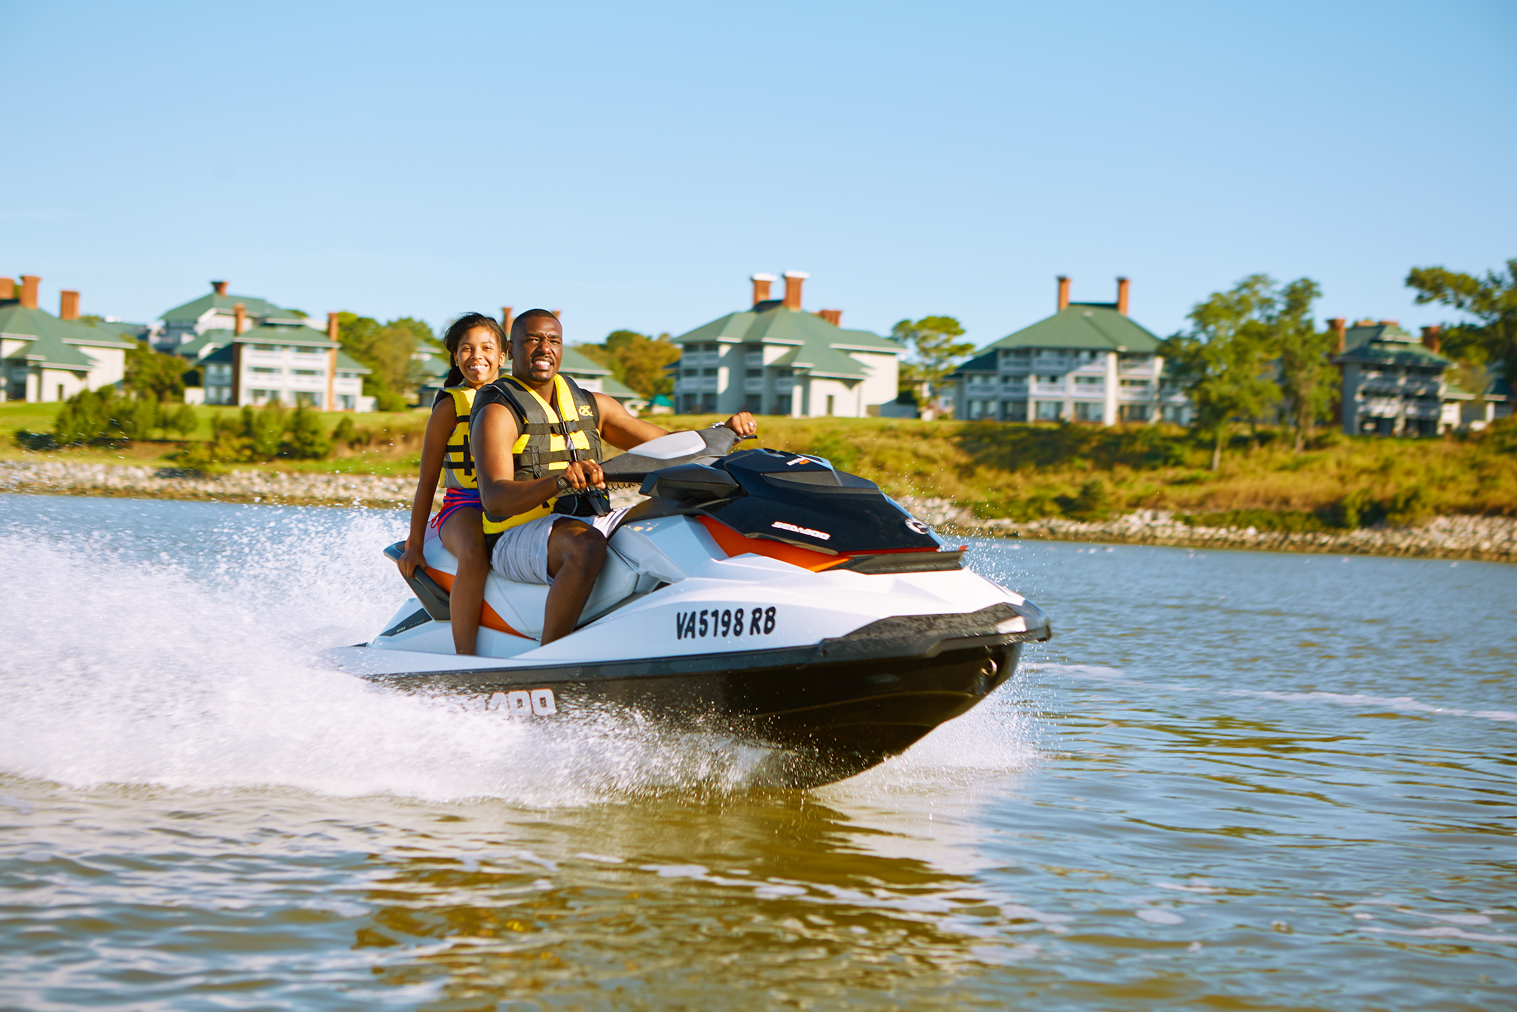 Jet Ski Rentals Recreation Marina